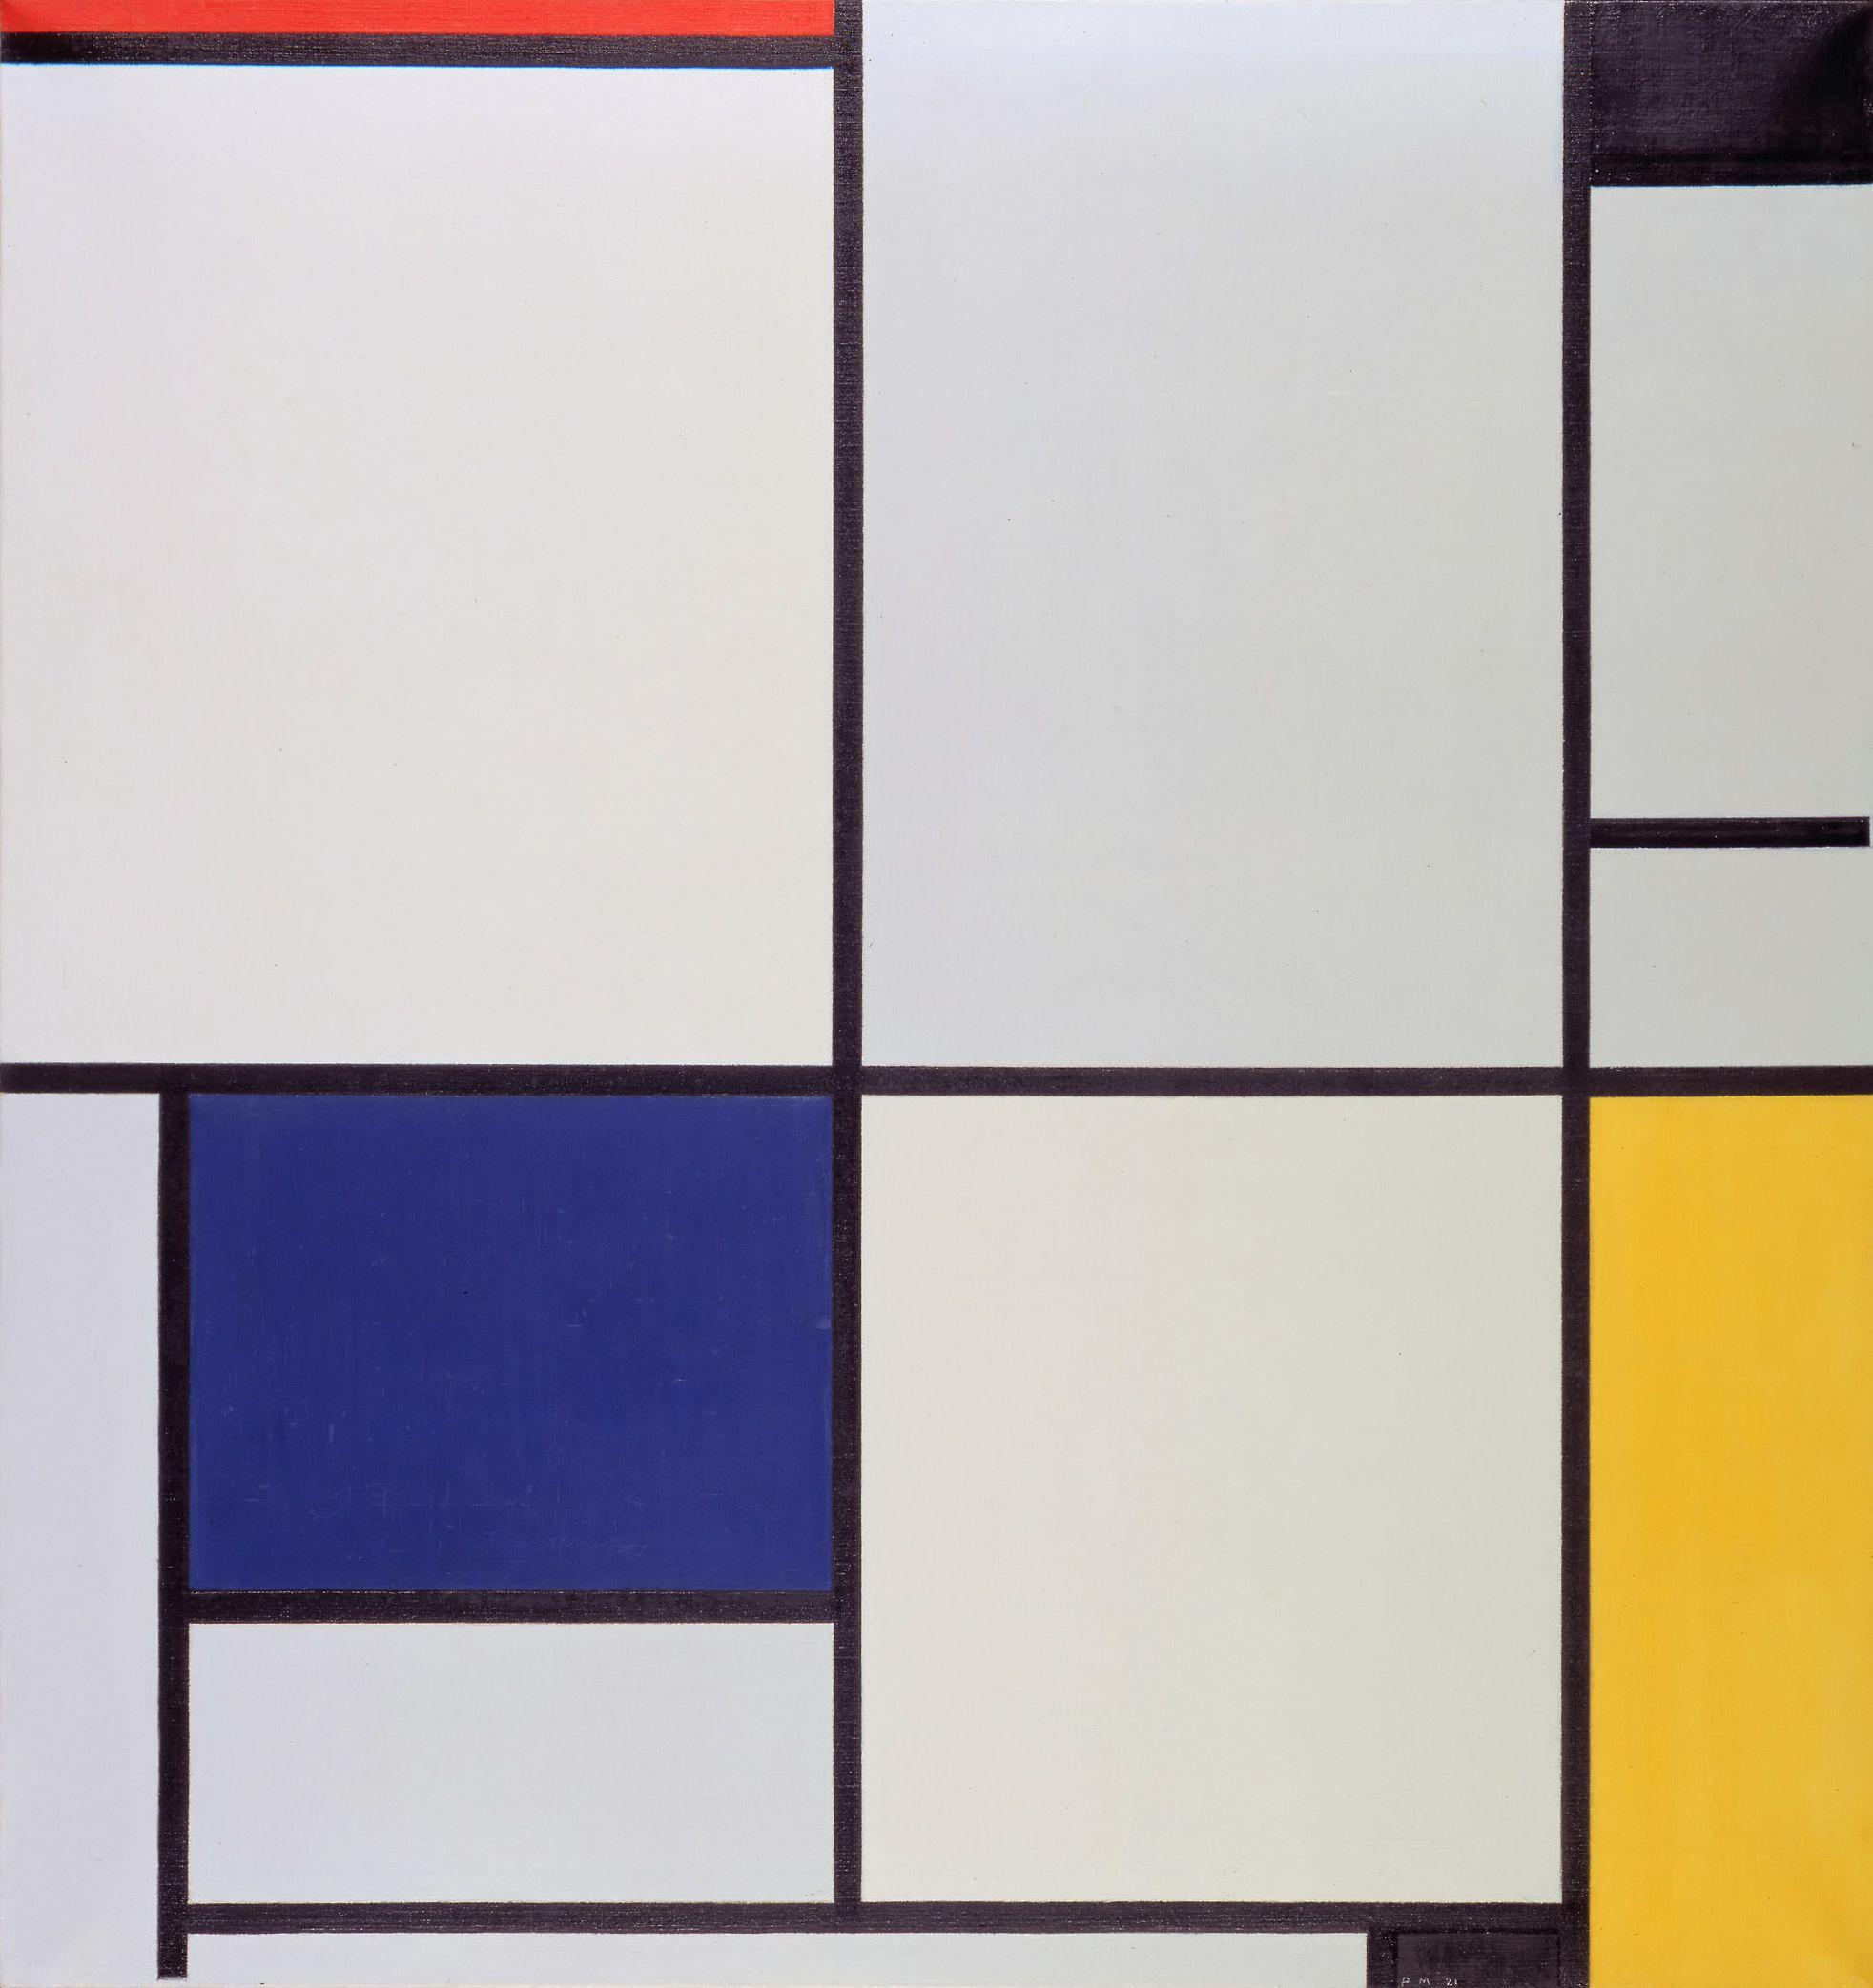 Piet Mondrian Tableau I (1921). Arte abstracto. Óleo